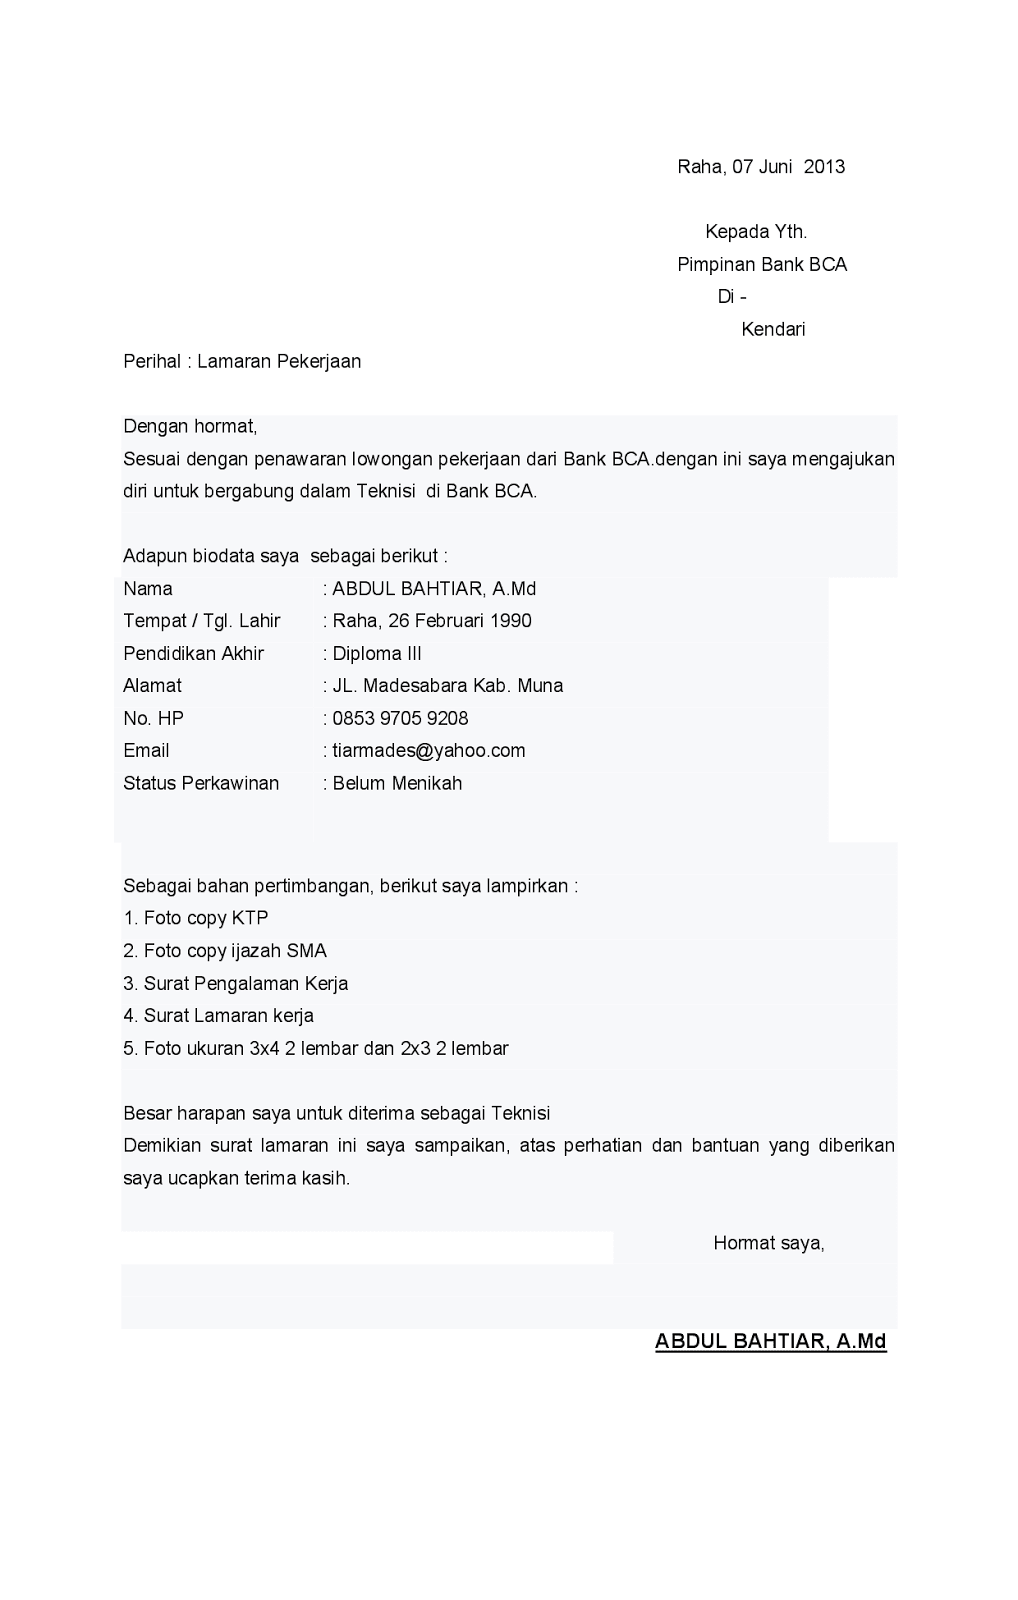 Contoh Surat Lamaran Alfamart